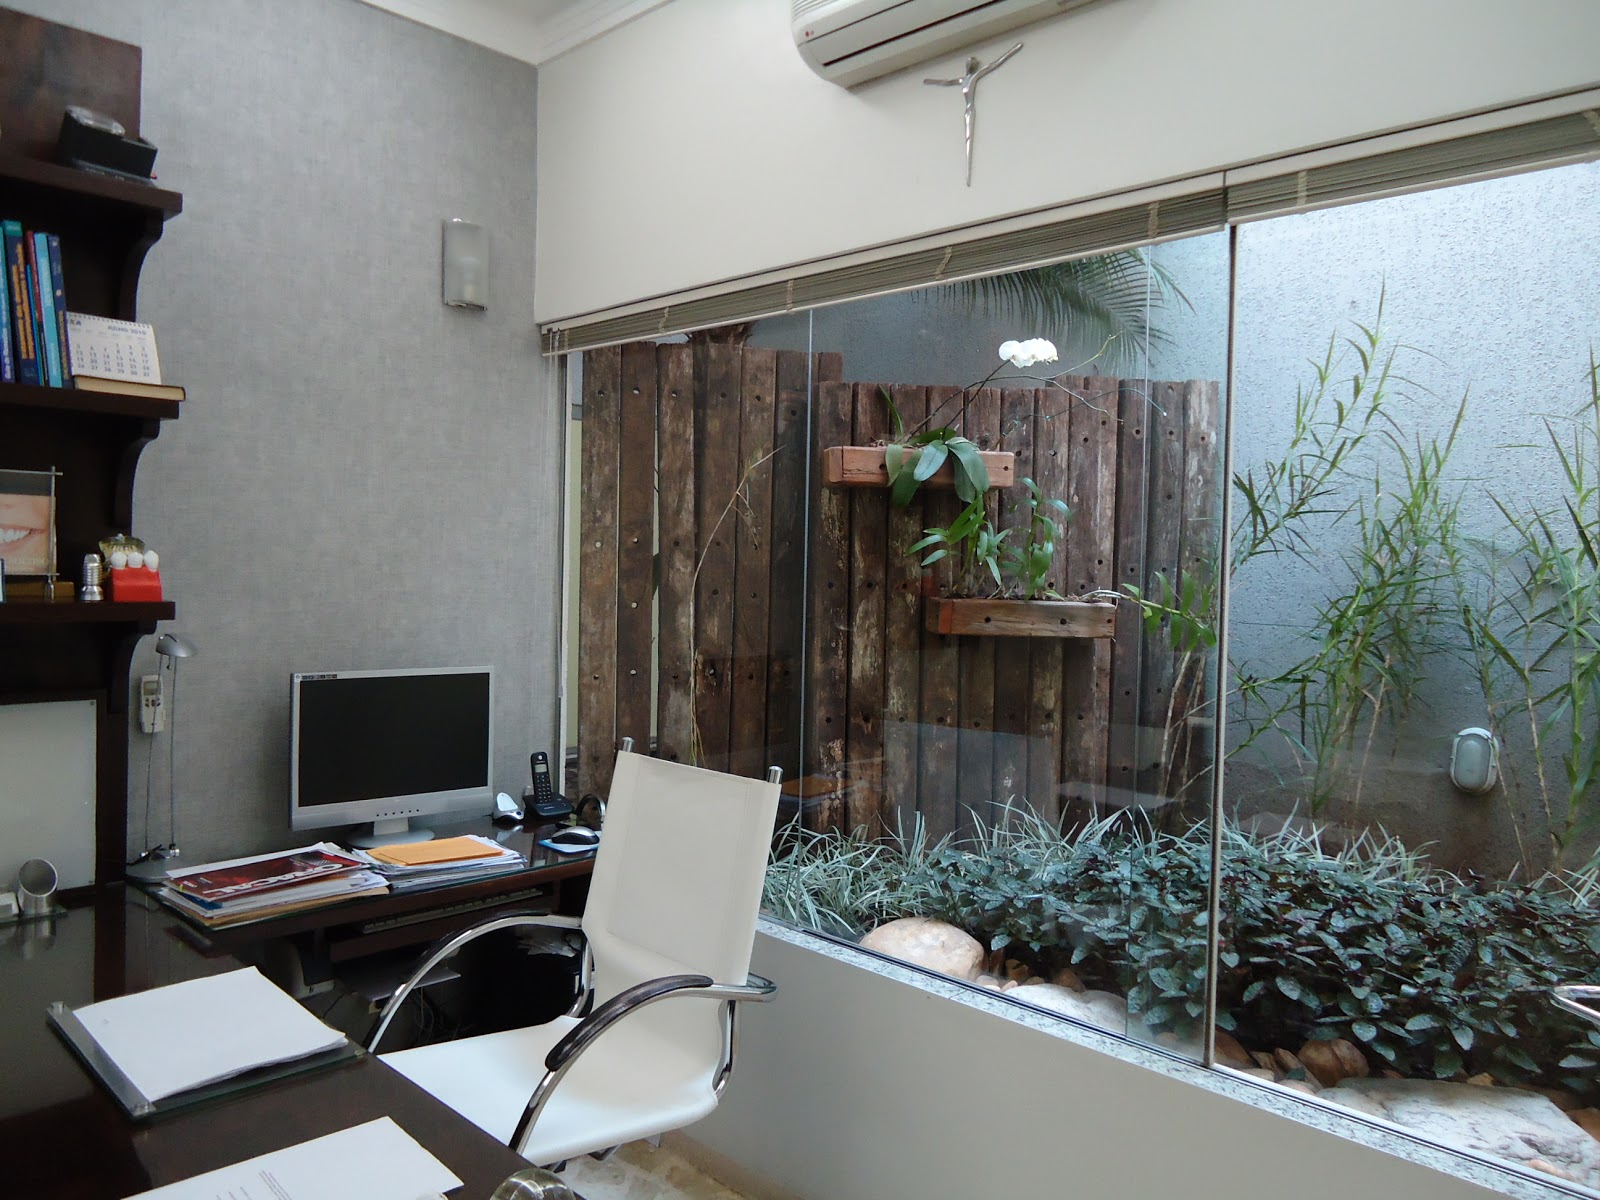 mesa jardim de inverno:Design de Interiores: Jardim de Inverno